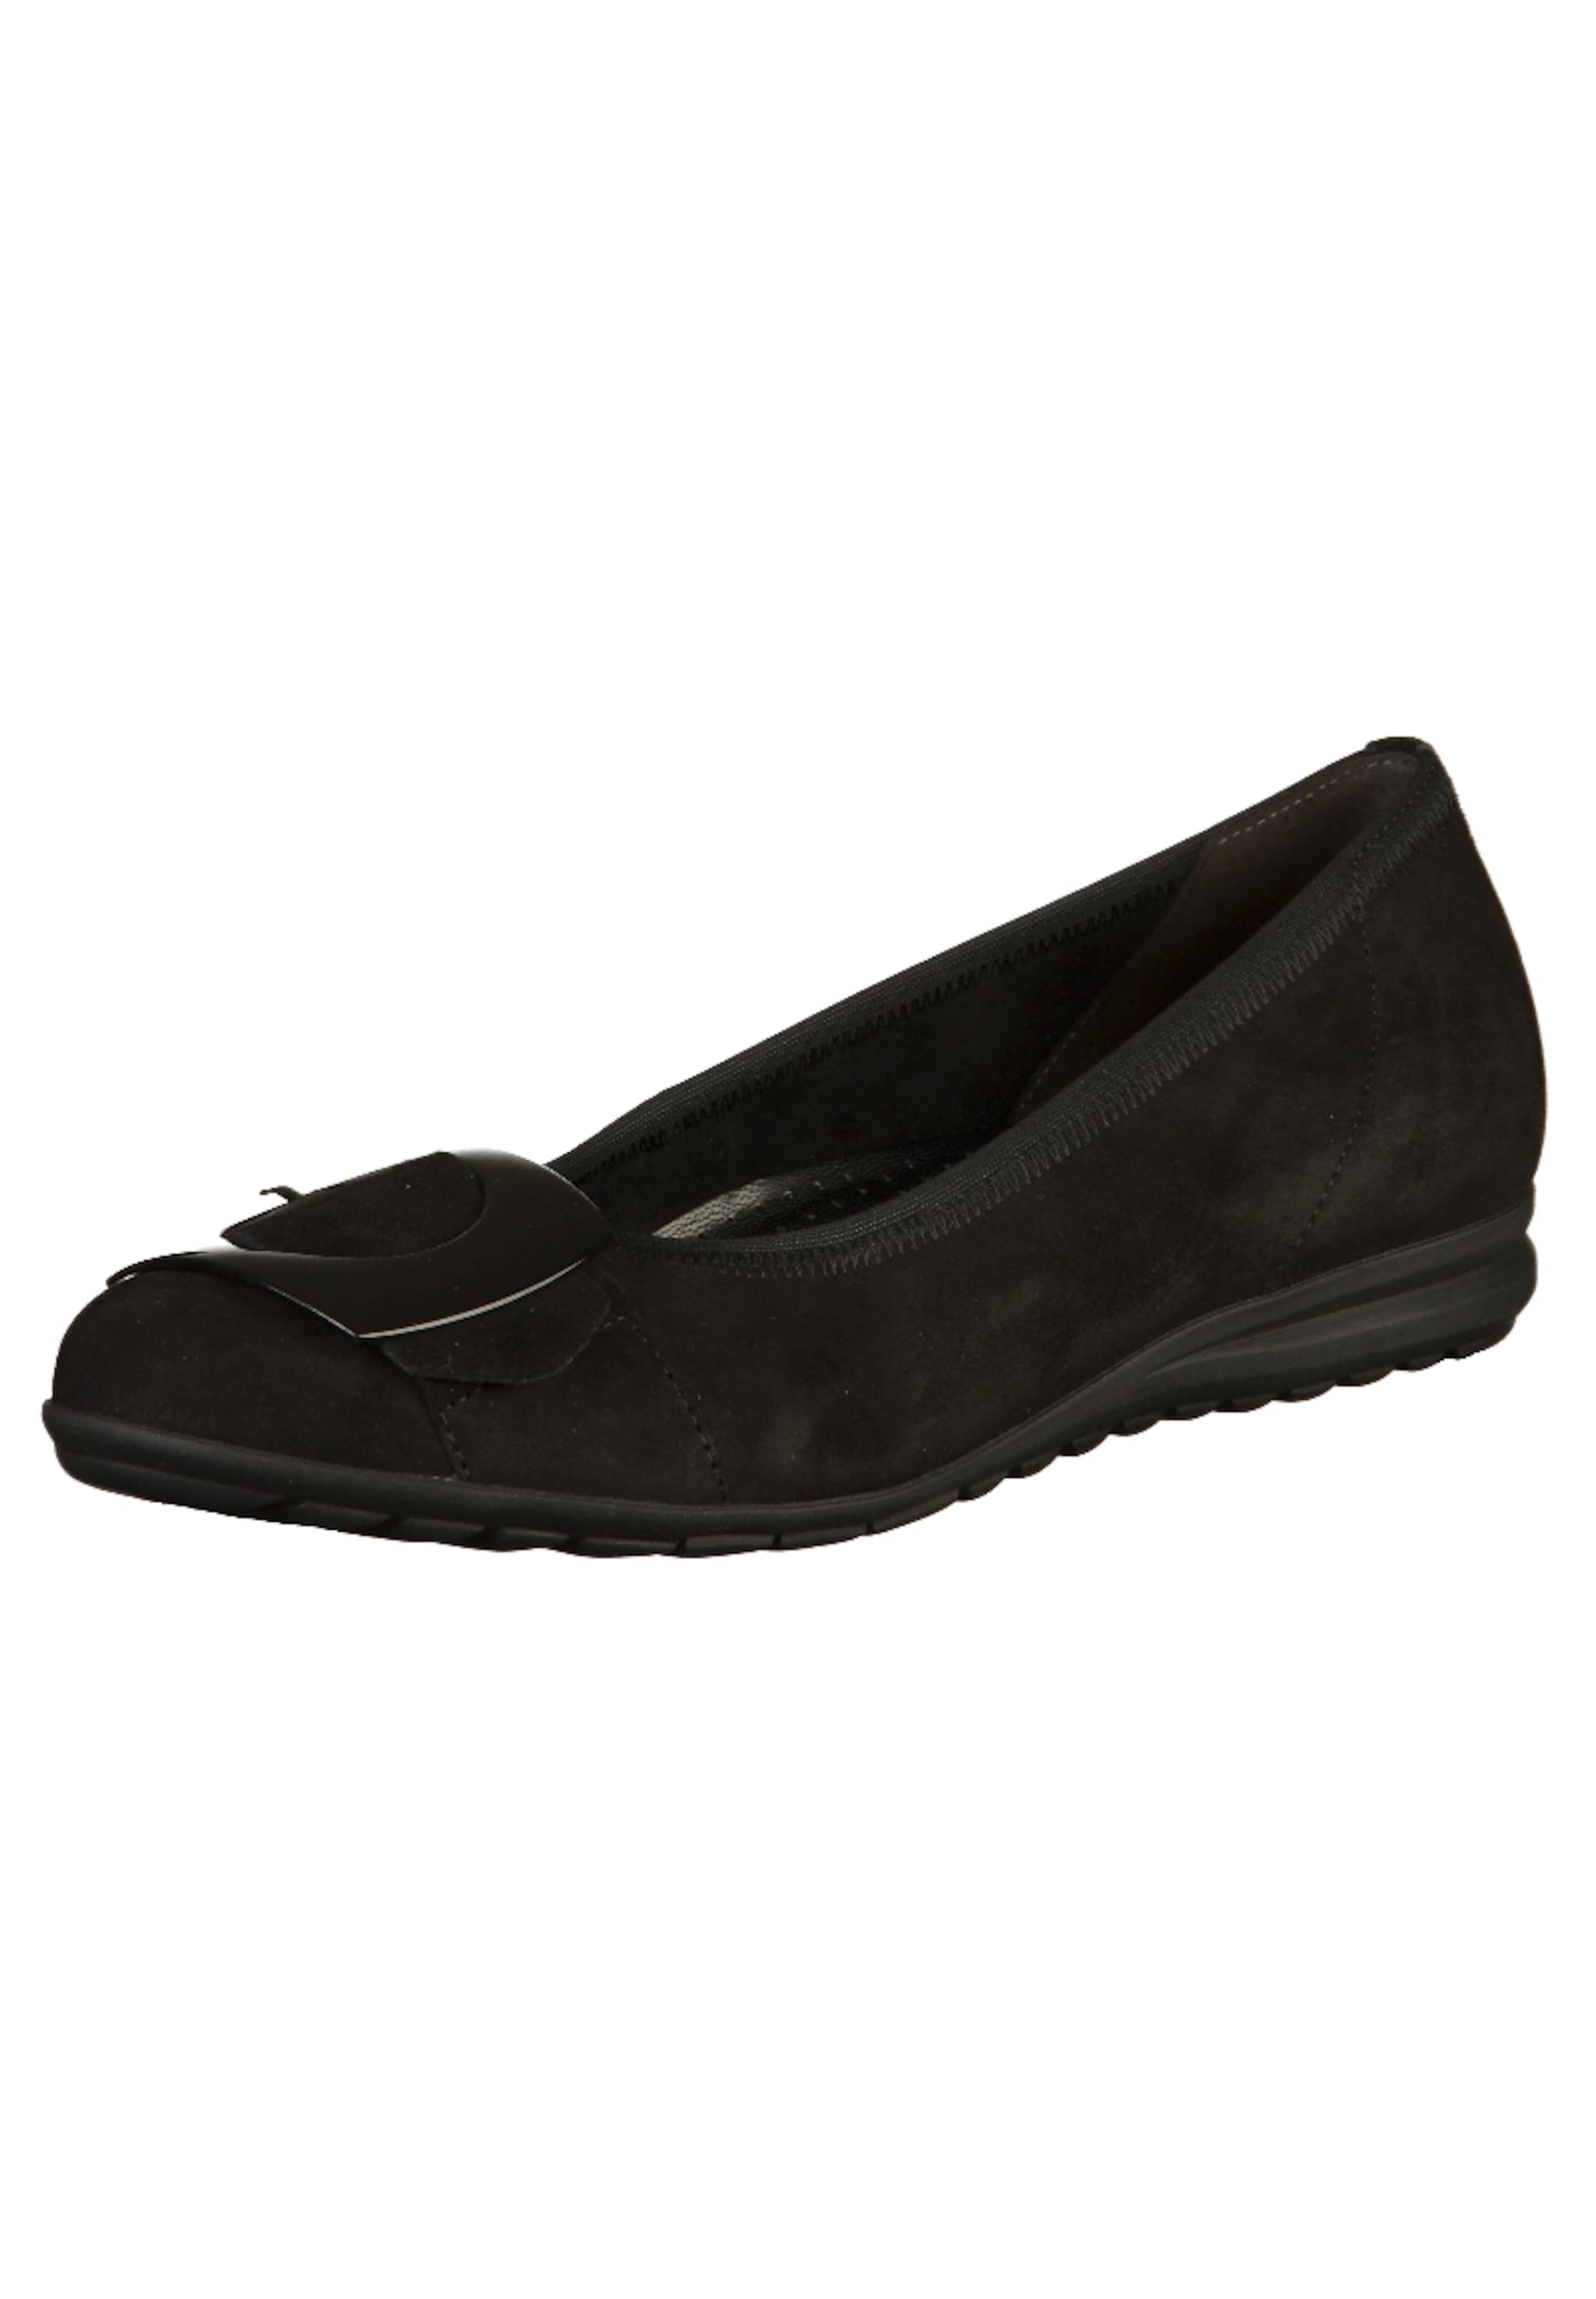 Haltbare Mode billige Schuhe GABOR | Ballerinas Schuhe Gut getragene Schuhe